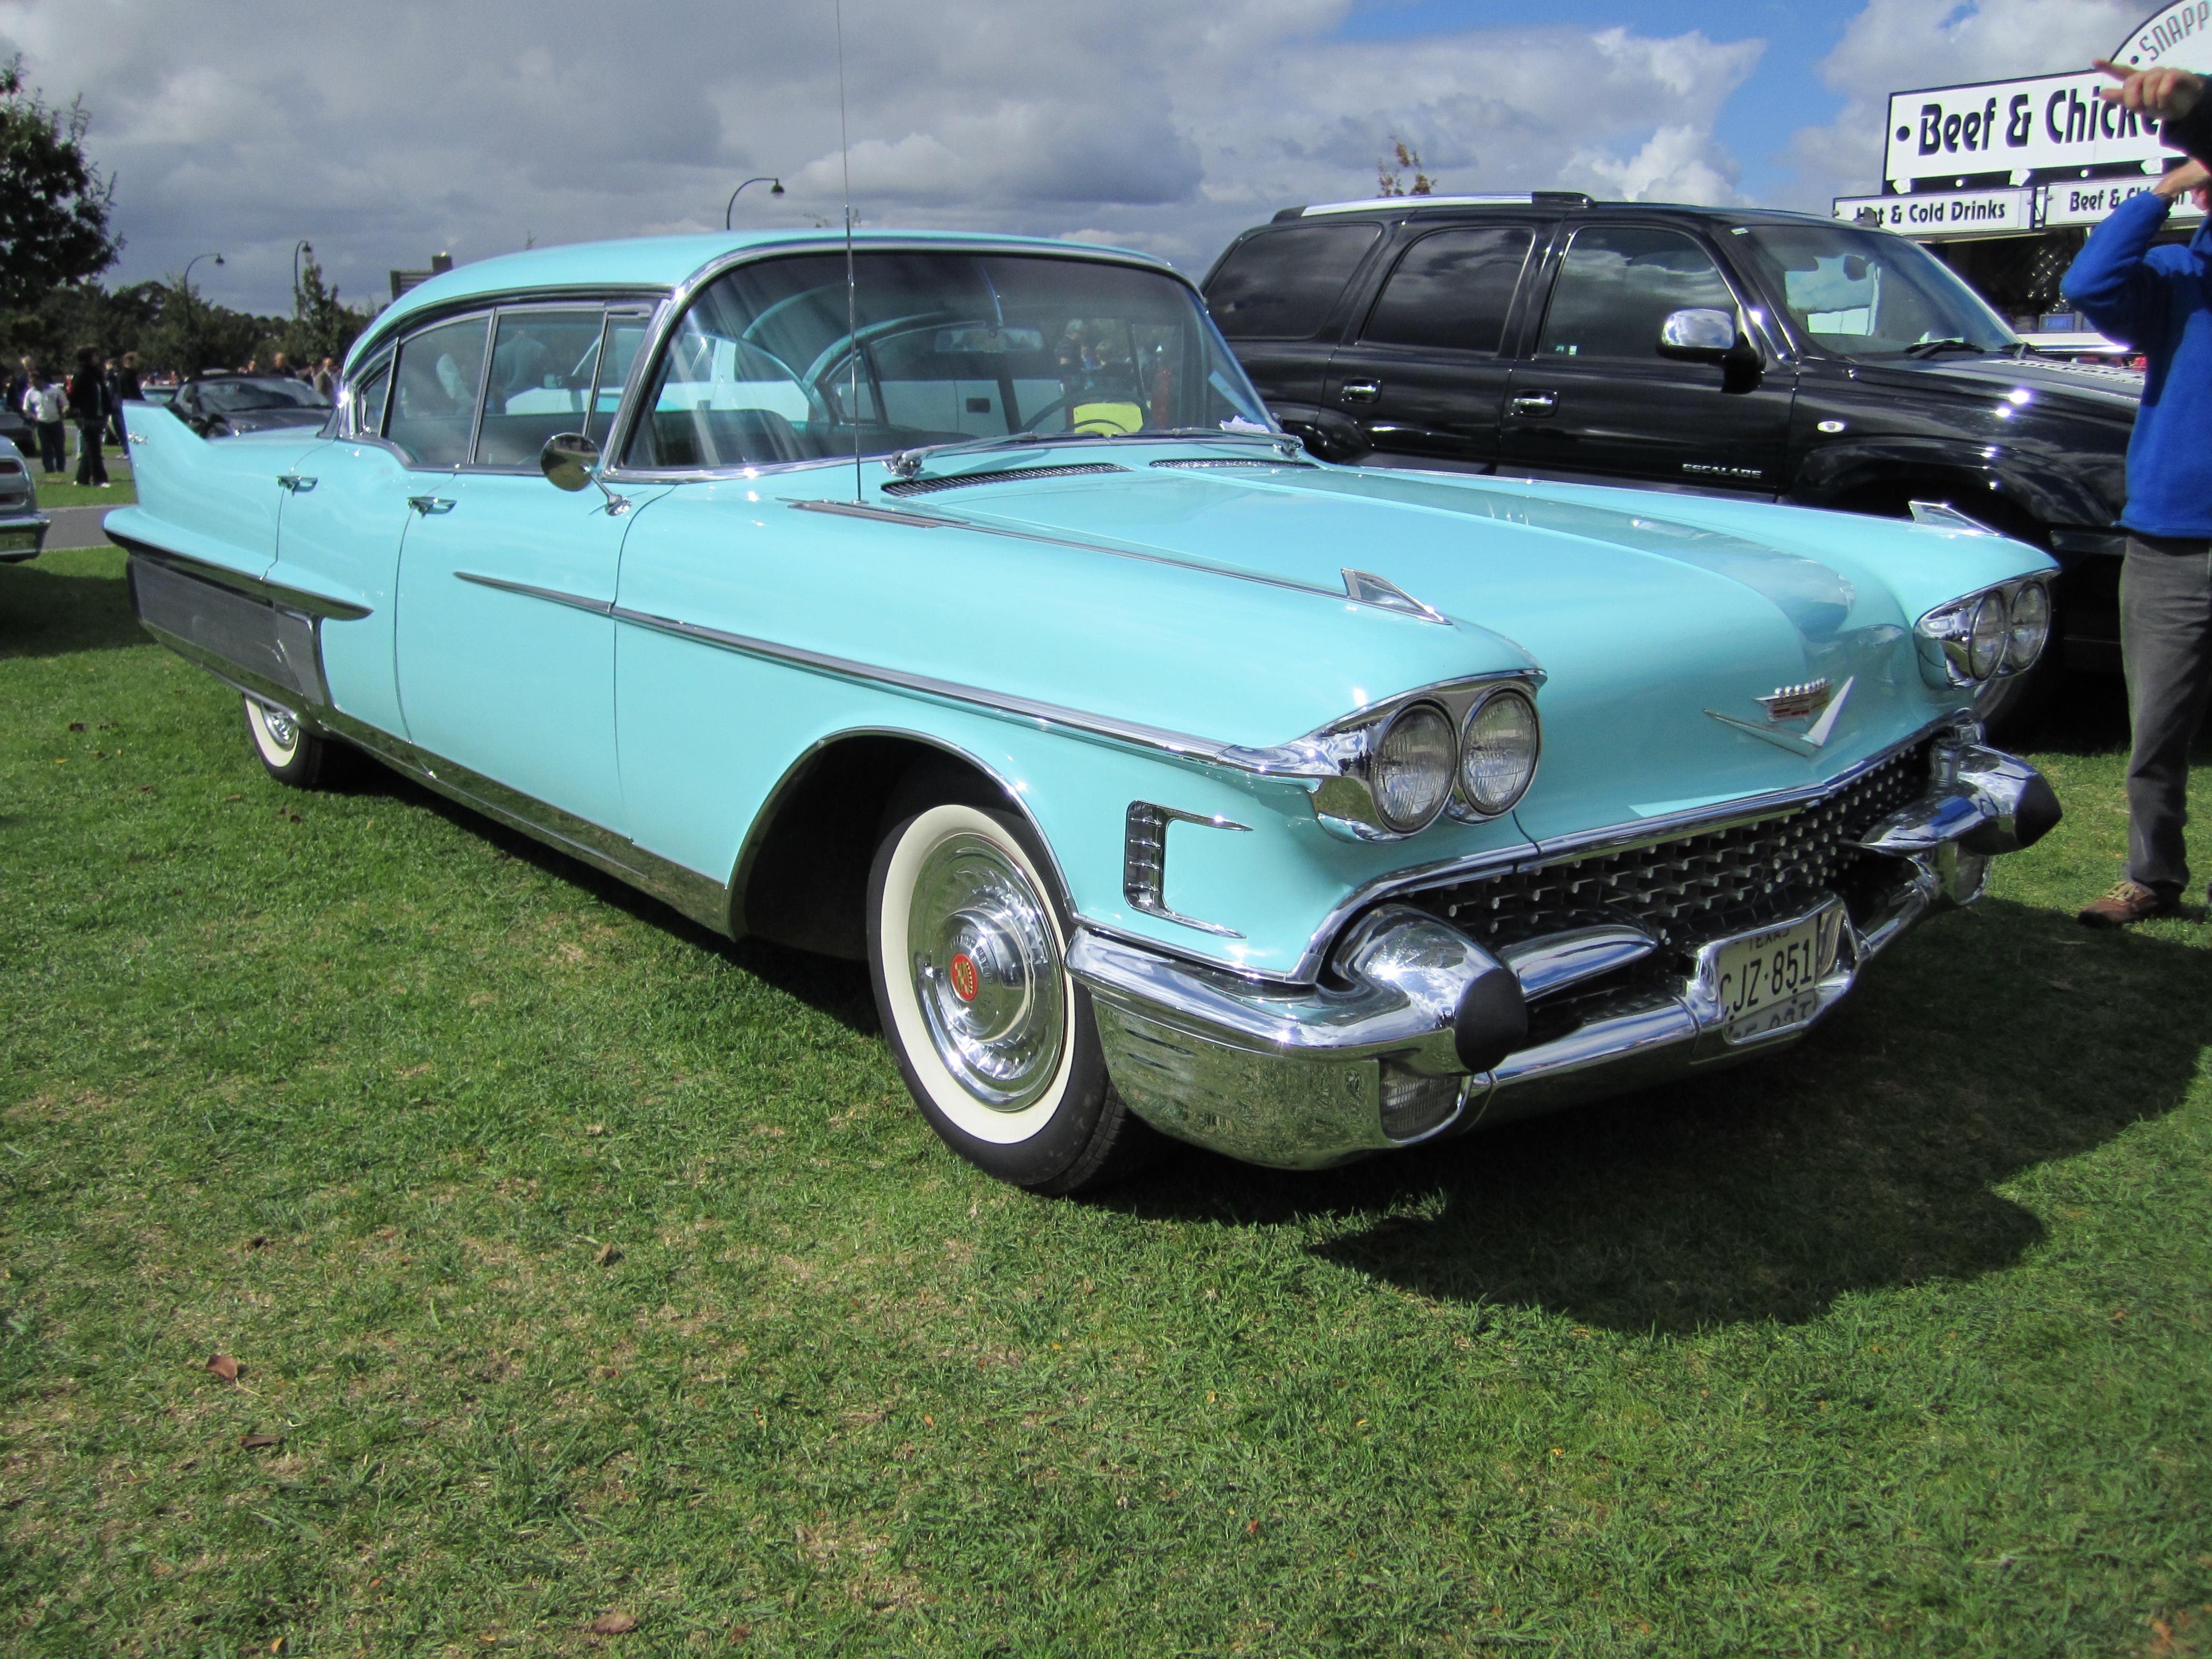 File 1976 cadillac sedan deville interior jpg wikimedia commons - Description 1958 Cadillac Sedan Deville Jpg